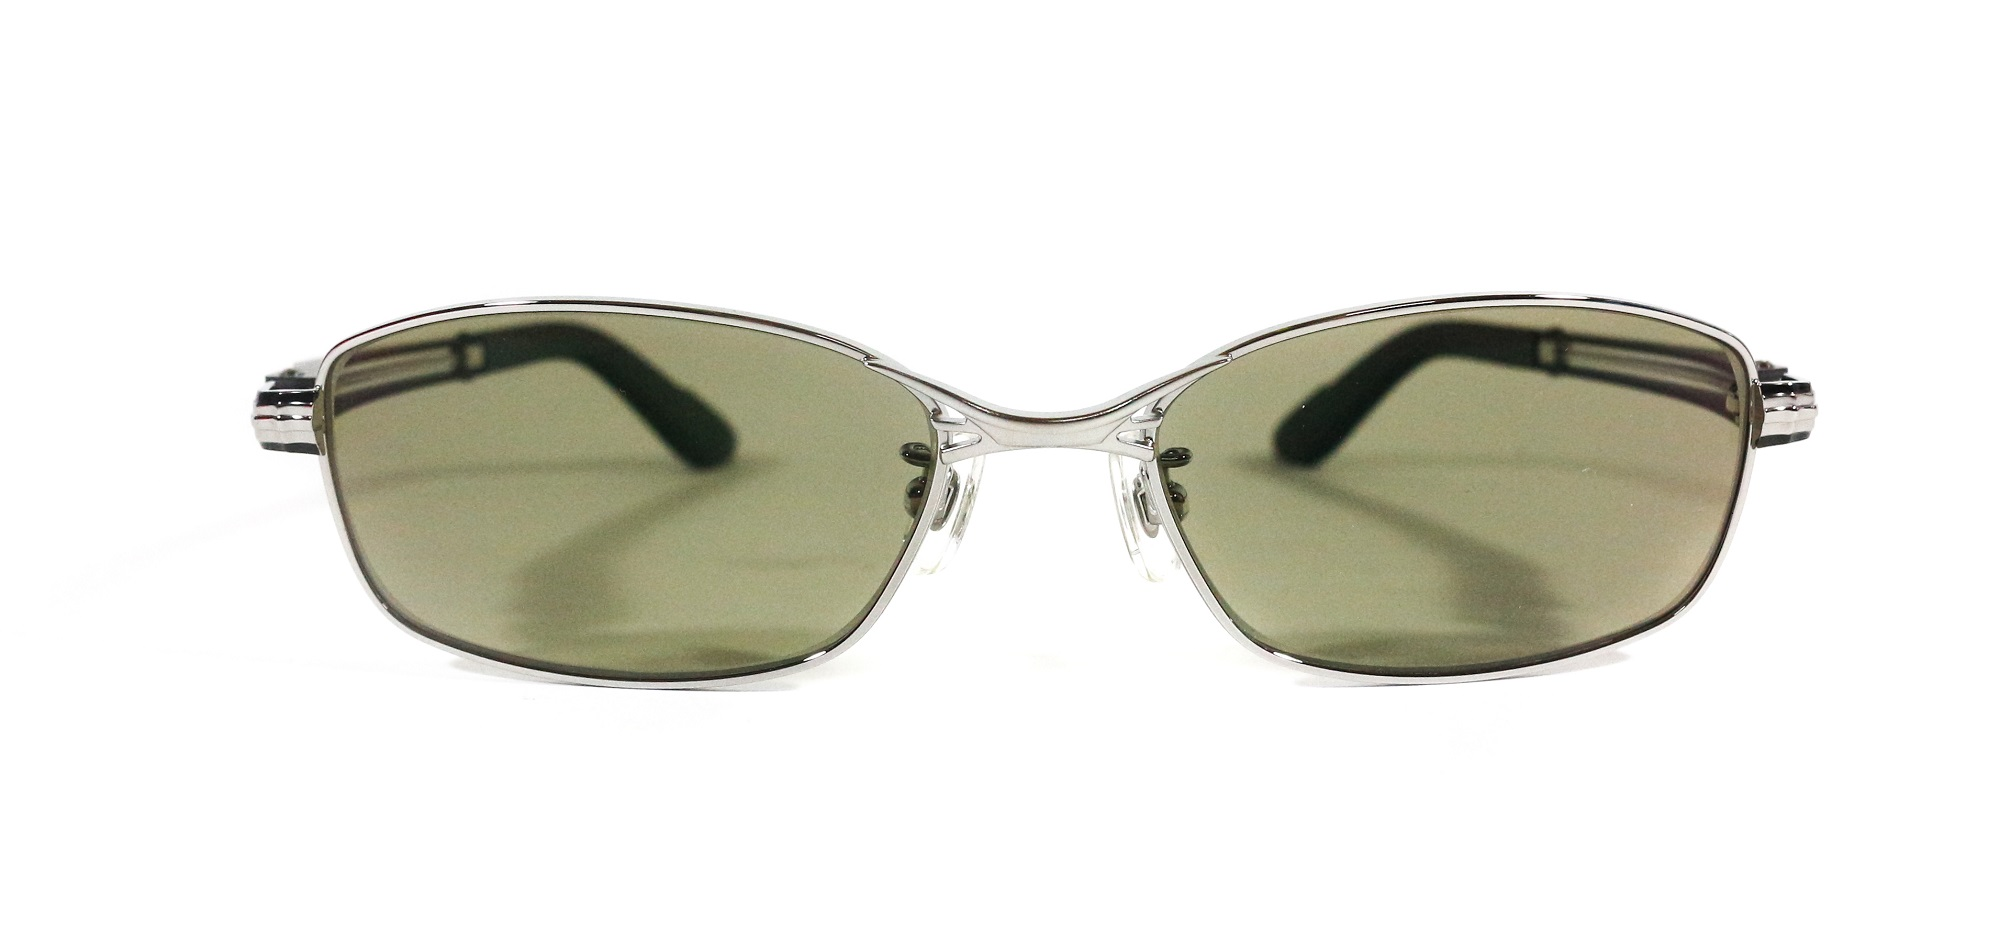 Zeque Polarised Fishing Sunglasses Feiz Alt F-1350 MATTE CHROME TVS (3534)